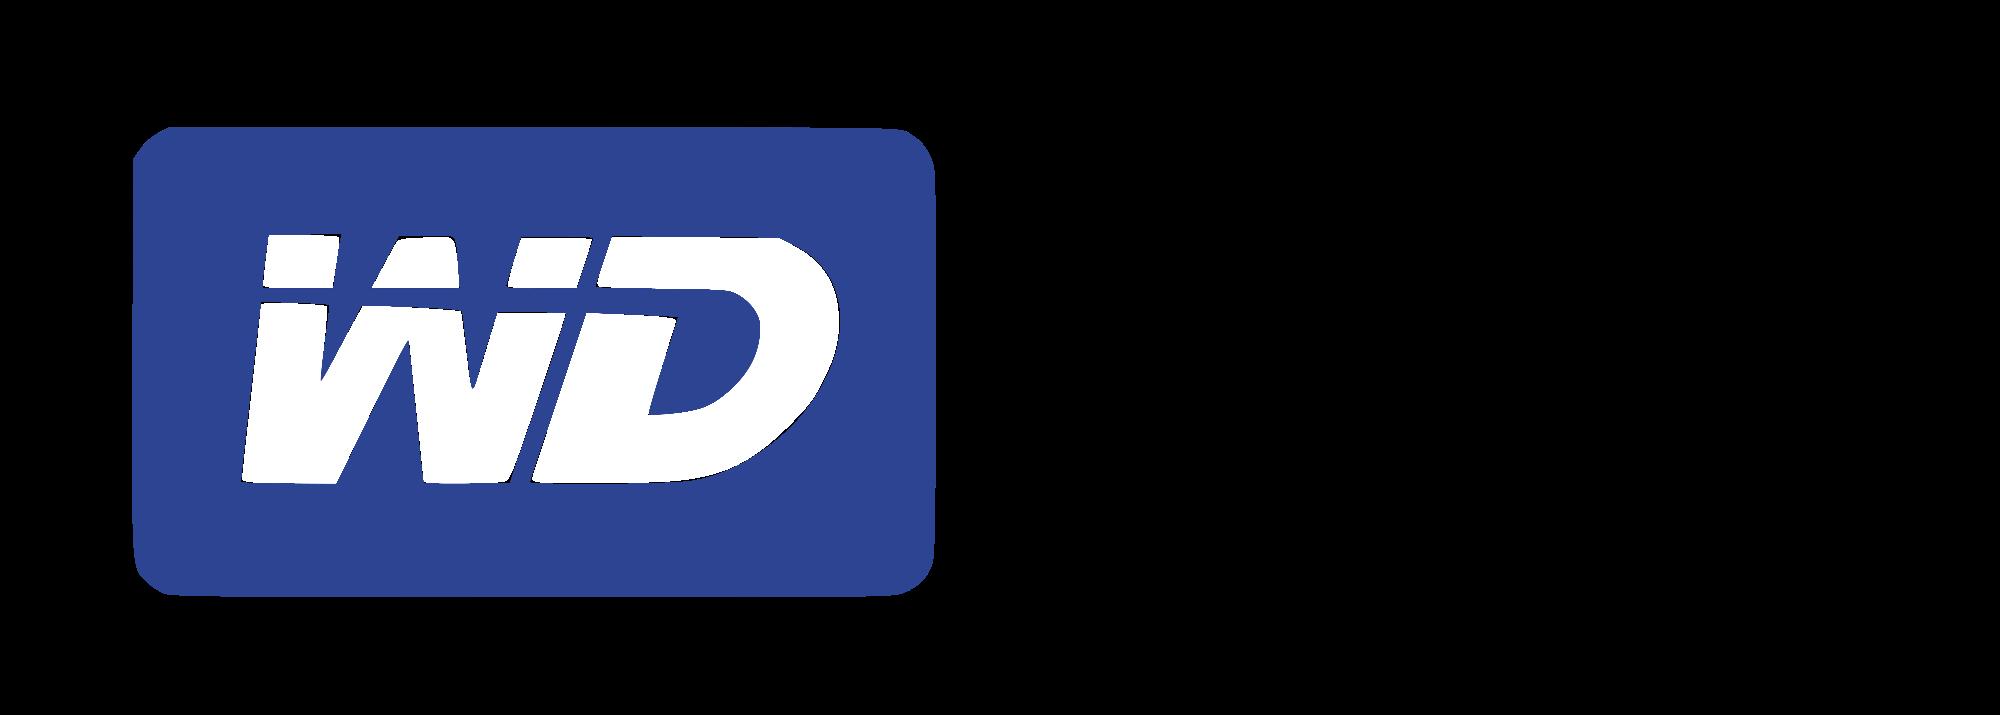 Western Digital Logo 5 - Western Digital Logo